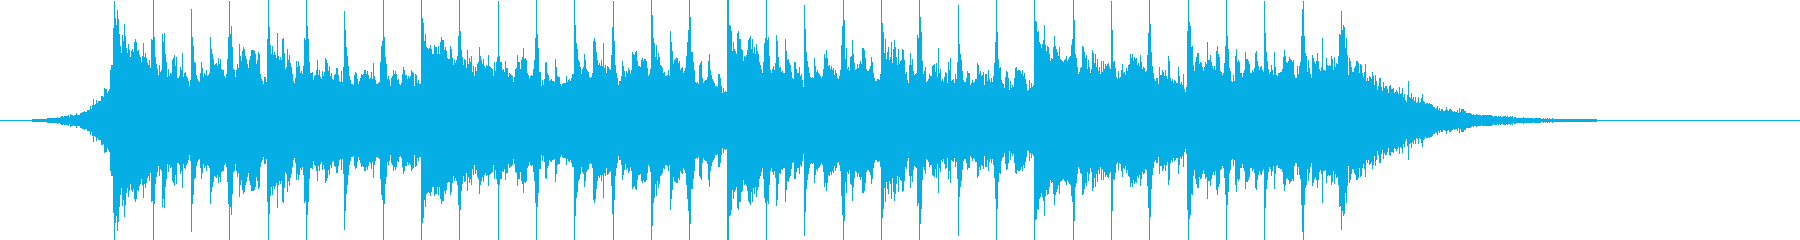 Corporate Synth 137の再生済みの波形